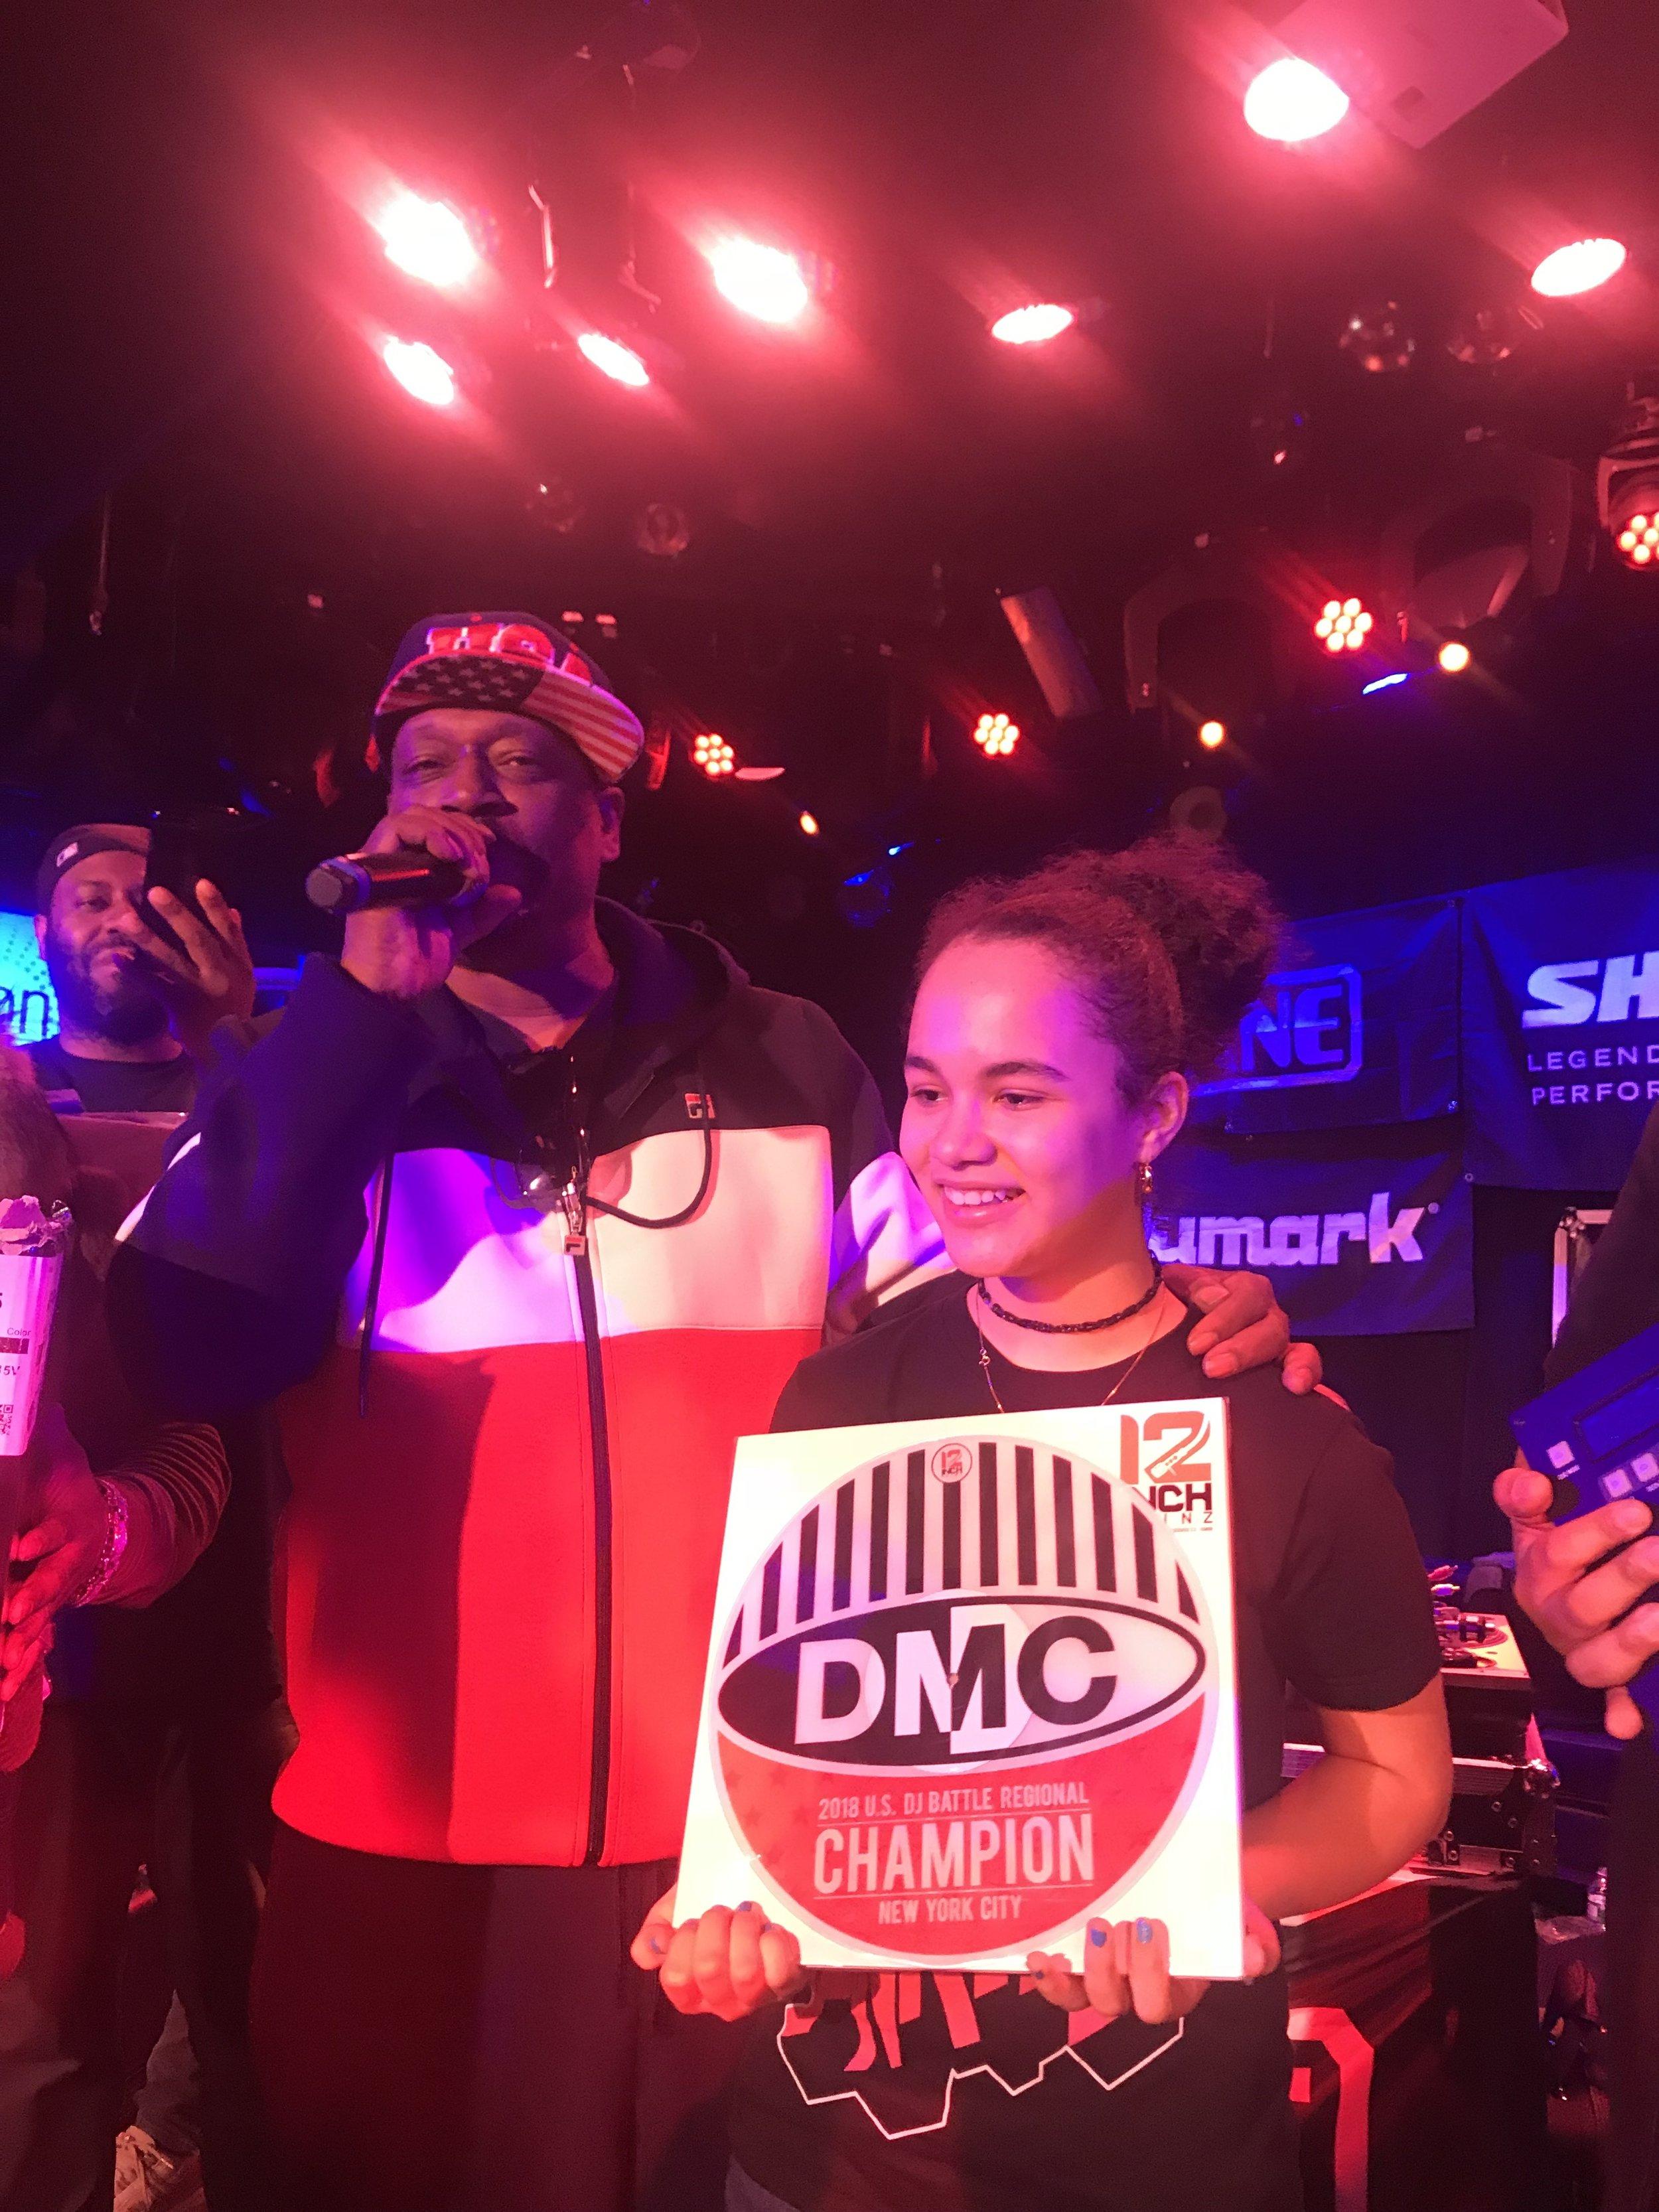 GrandMaster Caz announces Kool Flash DMC NYC Champion 2018.jpg